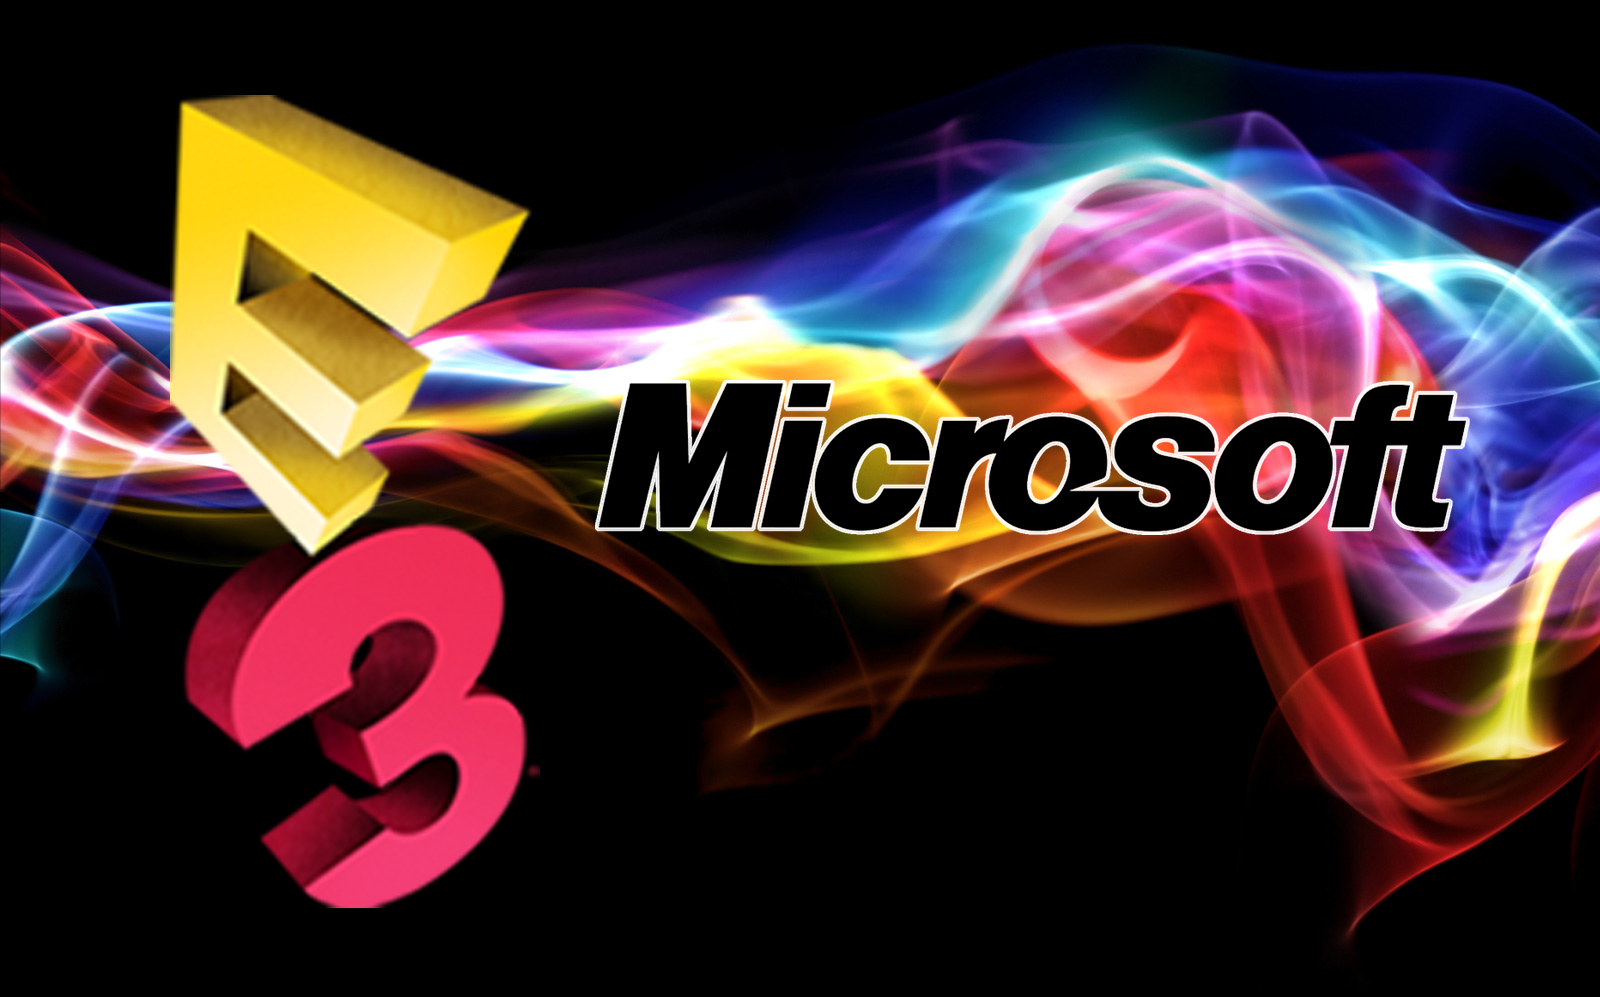 Microsoft E3 2013 Liveblog